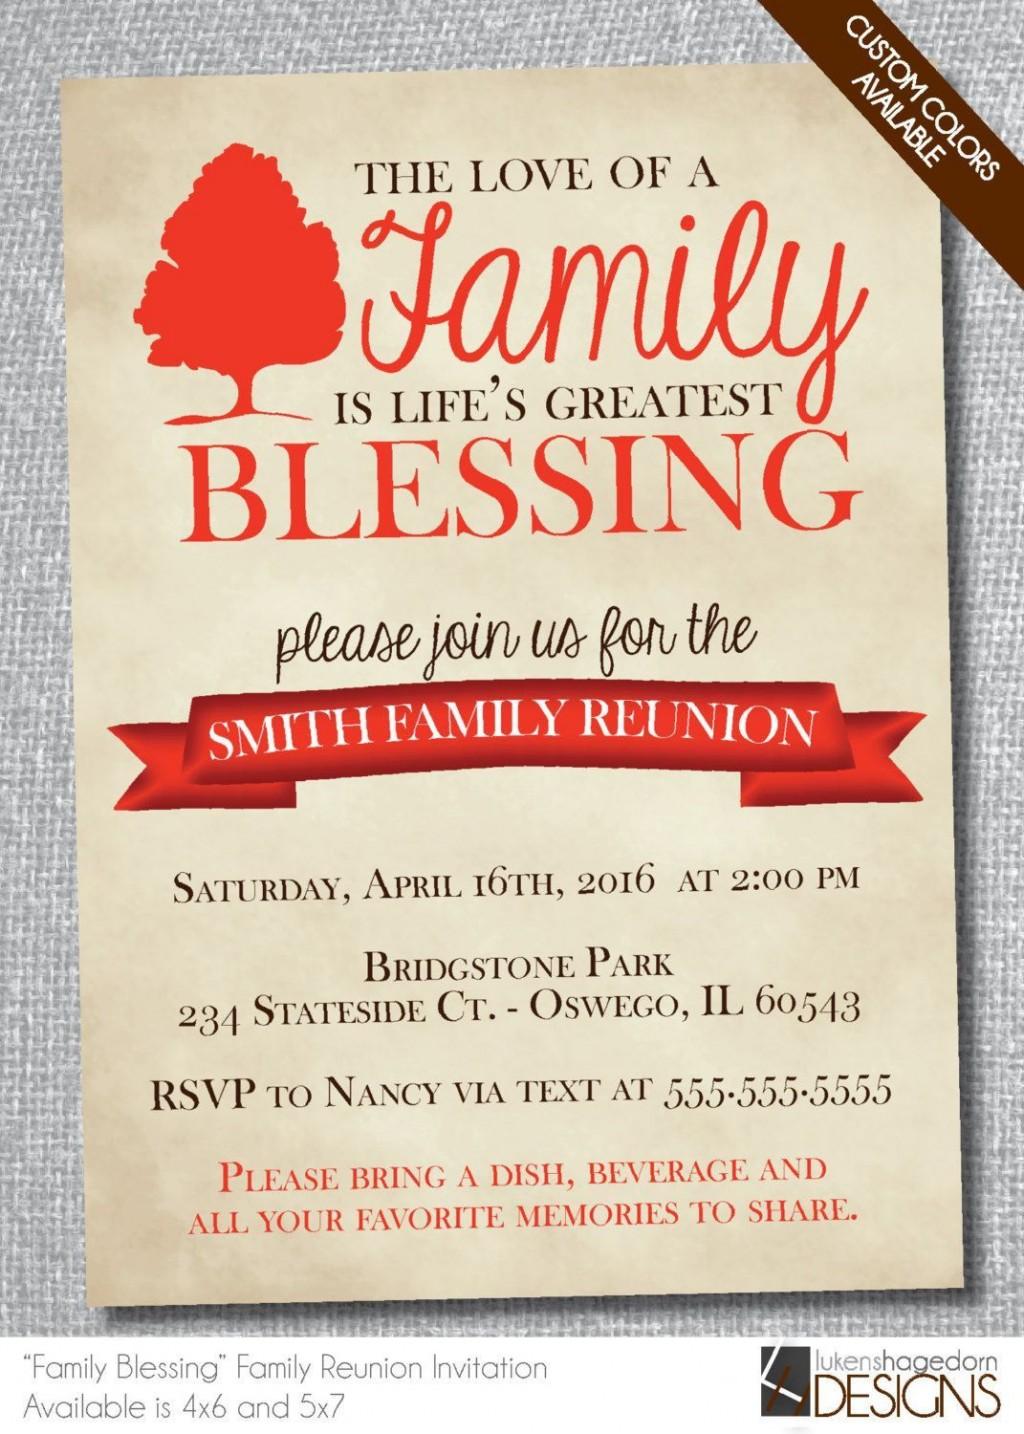 004 Impressive Family Reunion Flyer Template Free Sample  Downloadable Printable InvitationLarge